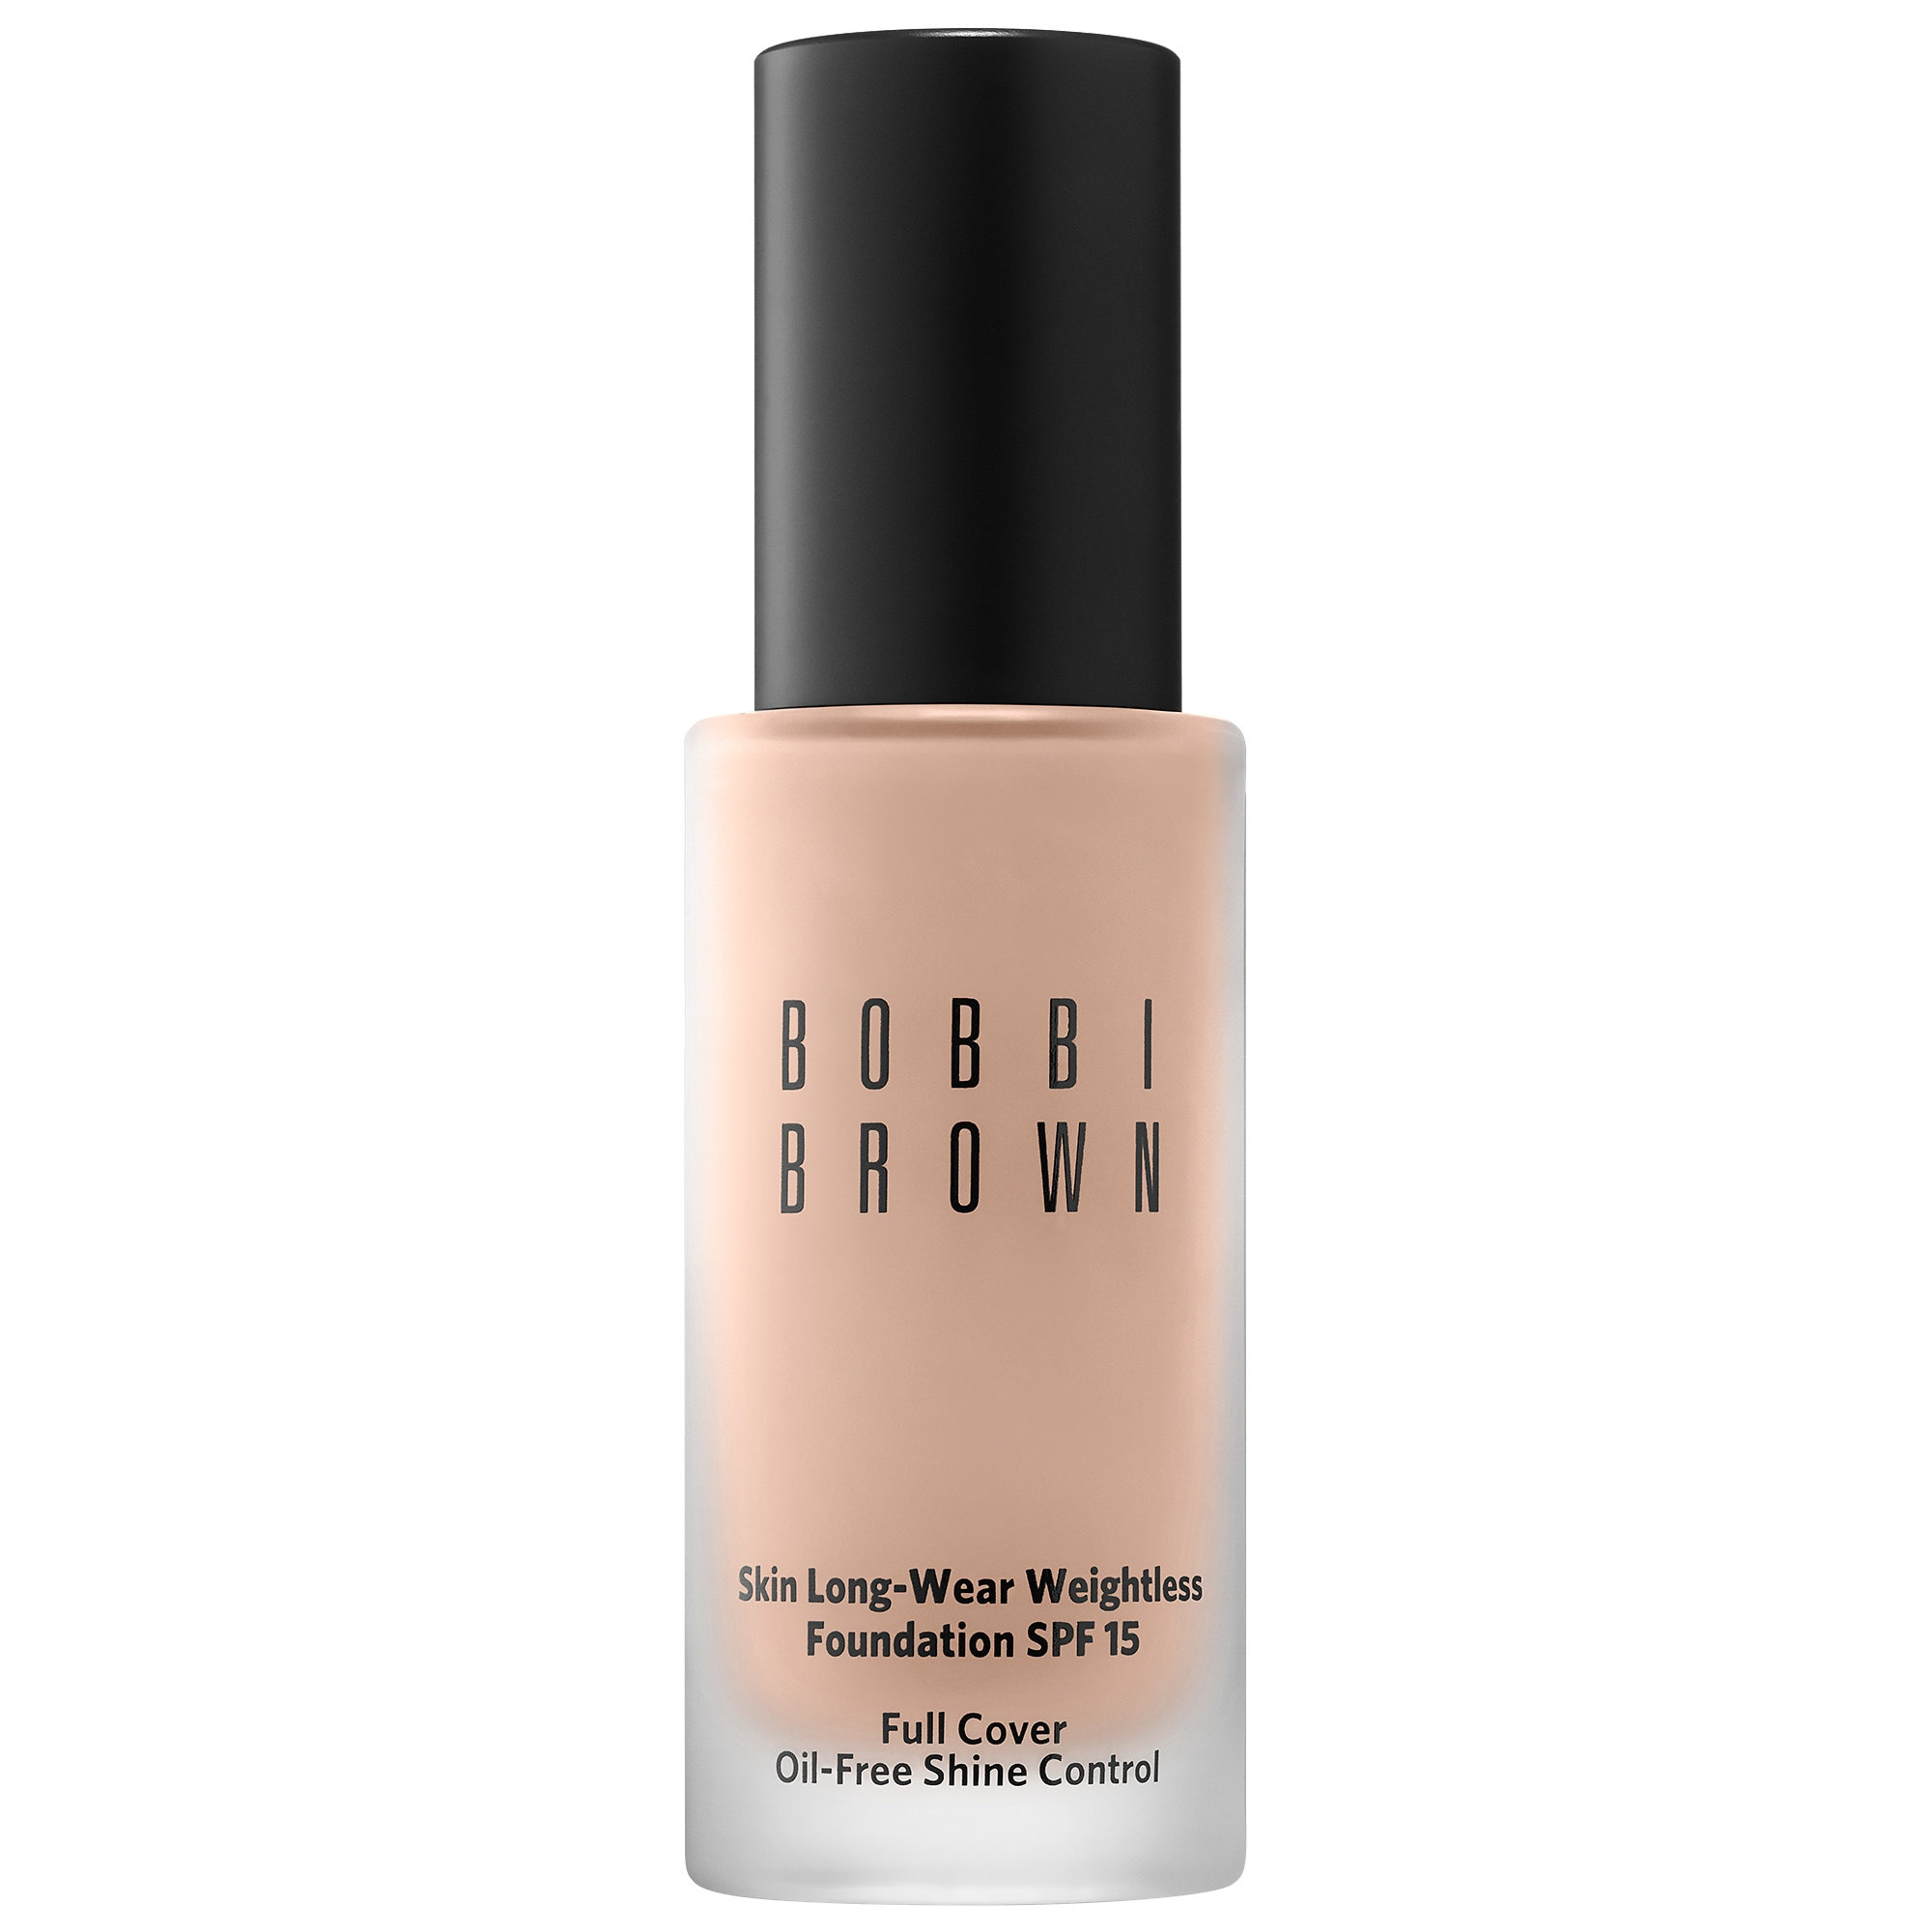 Bobbi Brown - Skin Long-Wear Weightless Foundation SPF 15